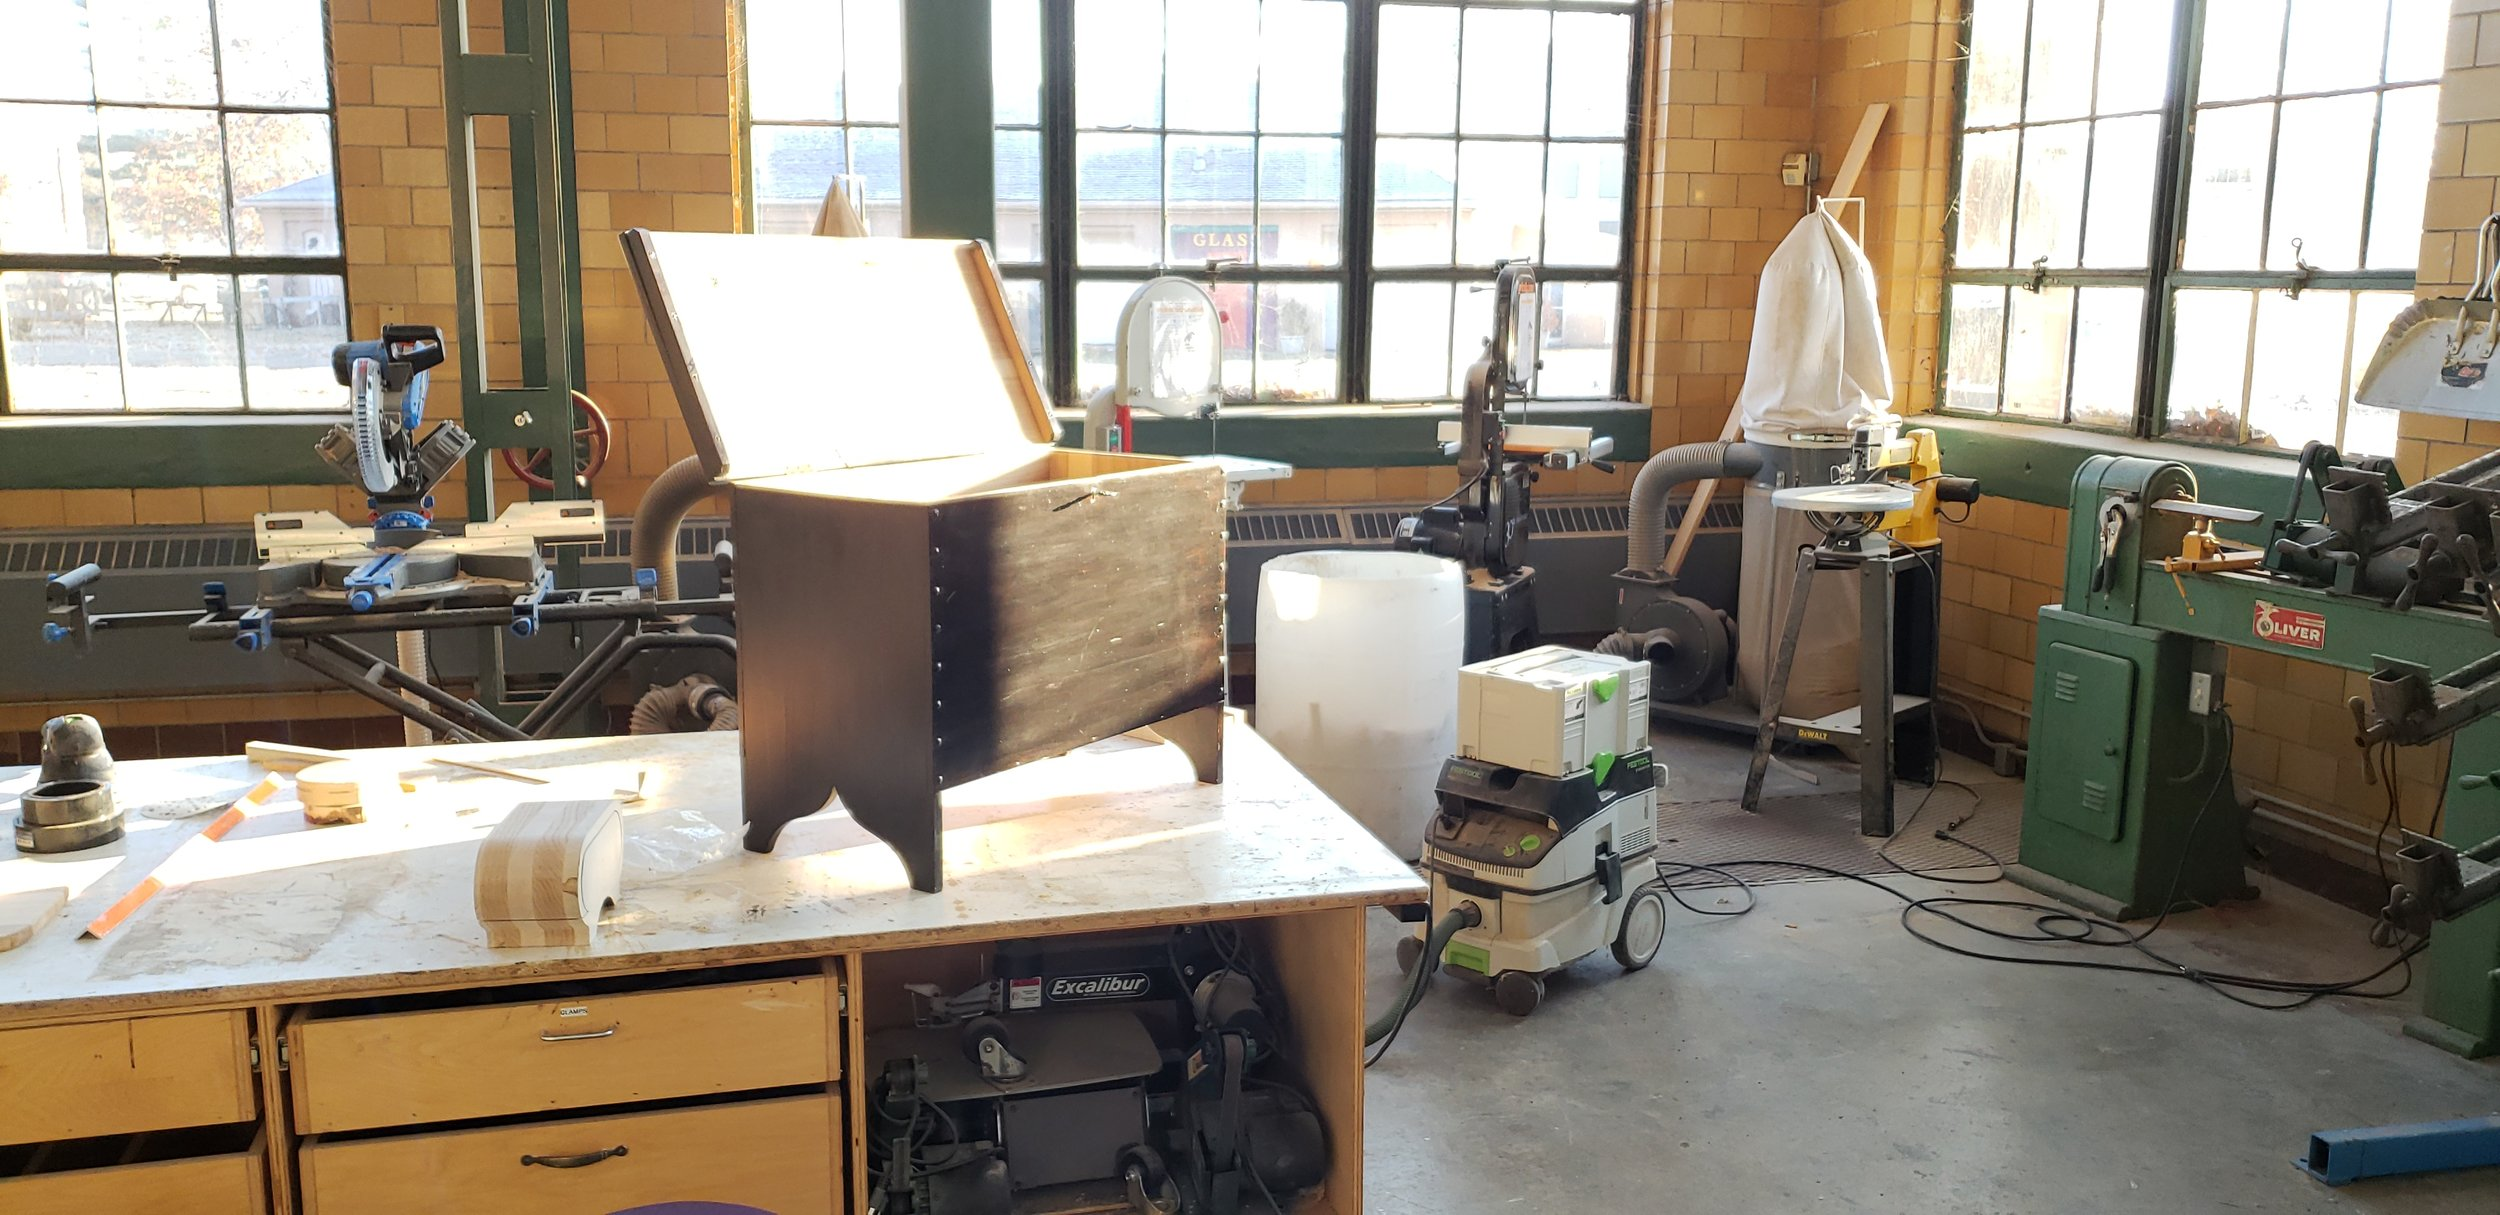 Woodworking classes - Michigan, Ohio, Indiana, Northeast USA